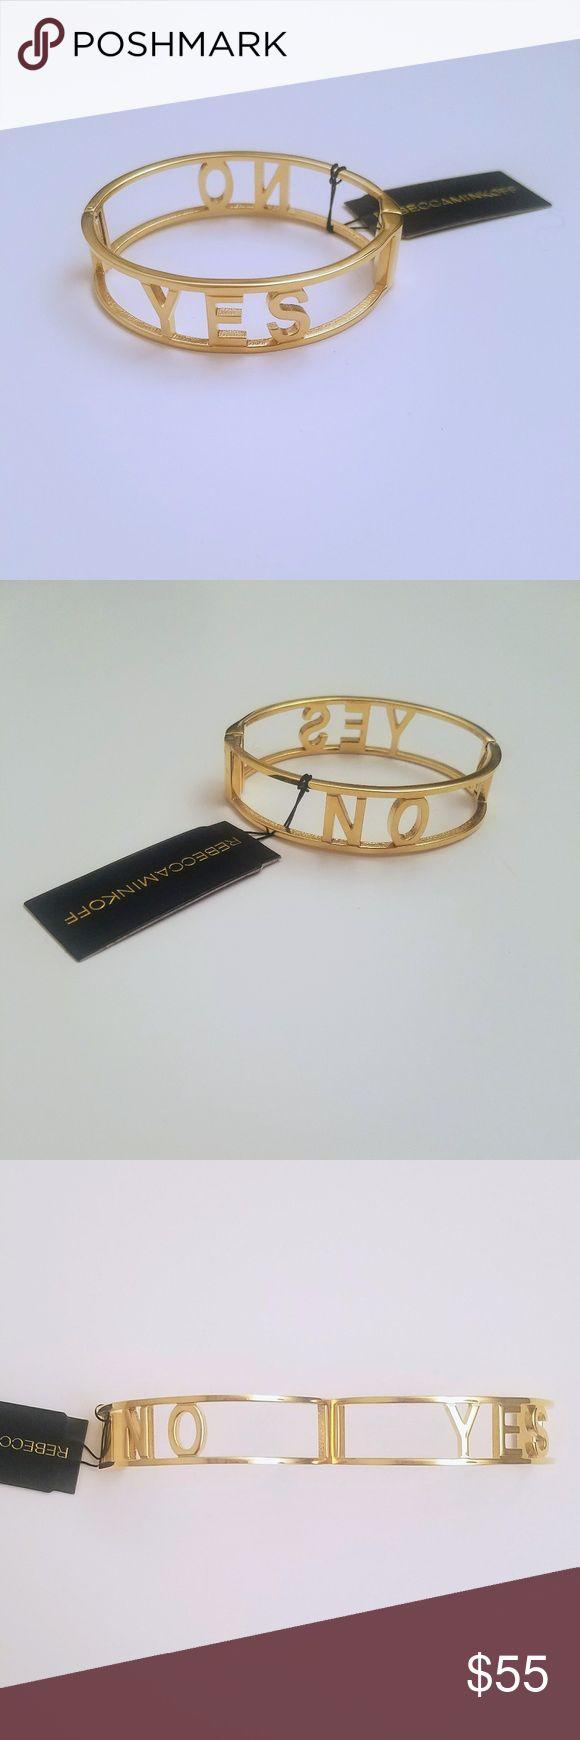 Rebecca Minkoff Gold Yes No Bracelet Rebecca Minkoff Gold Yes No Bracelet     Magnetic closure New with Tags Rebecca Minkoff Jewelry Bracelets